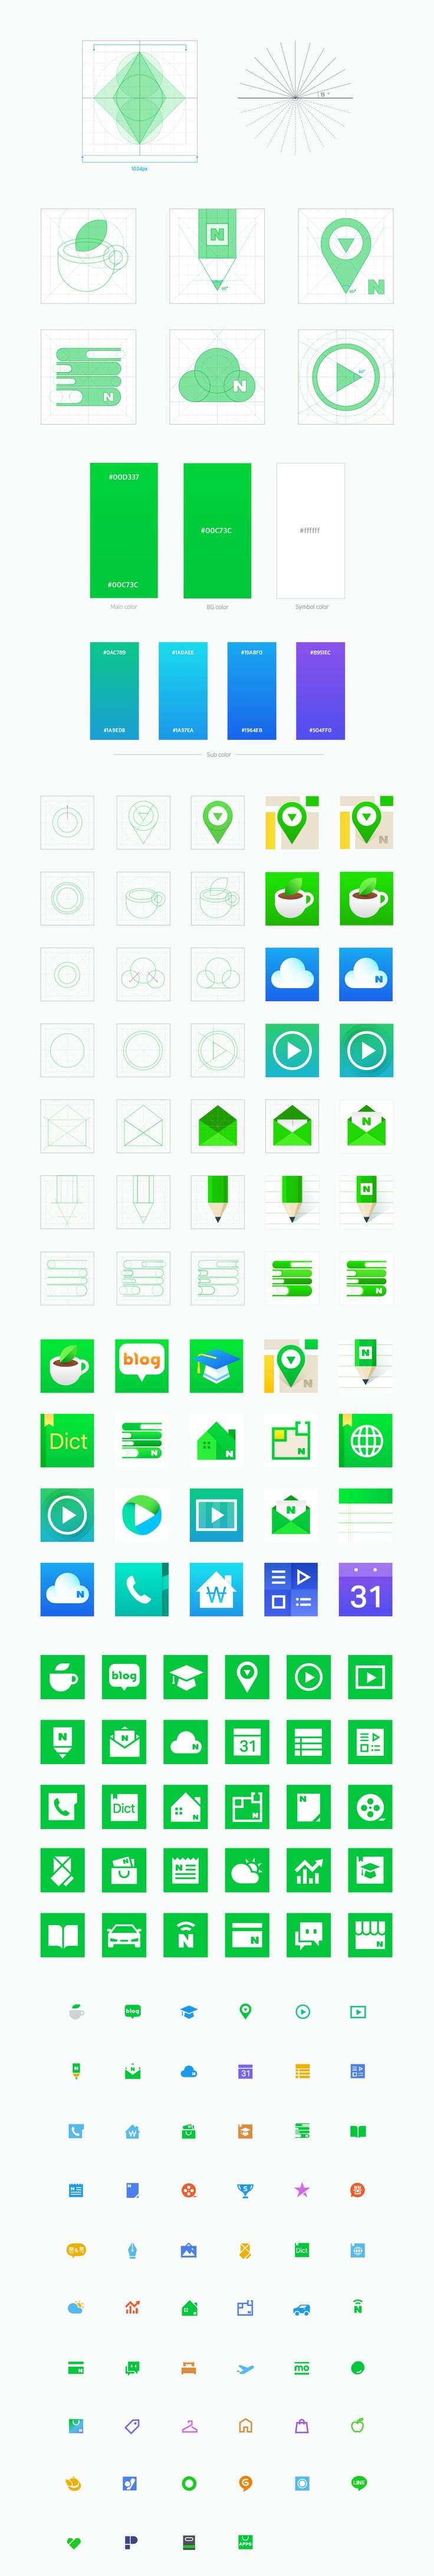 NAVER Square Identity네이버 스퀘어™는 '다양한 인터넷 경험을 연결하는 창'을 디자인 컨셉으로 사용자 한 명, 한 명에게 생생하고 유익한 경험을 제공한다는 서비스 가치를 담고 있습니다. The design concept of Naver Square™ is 'A Window Connecting Diverse Internet Experiences', which upholds a service value of providing vivid …